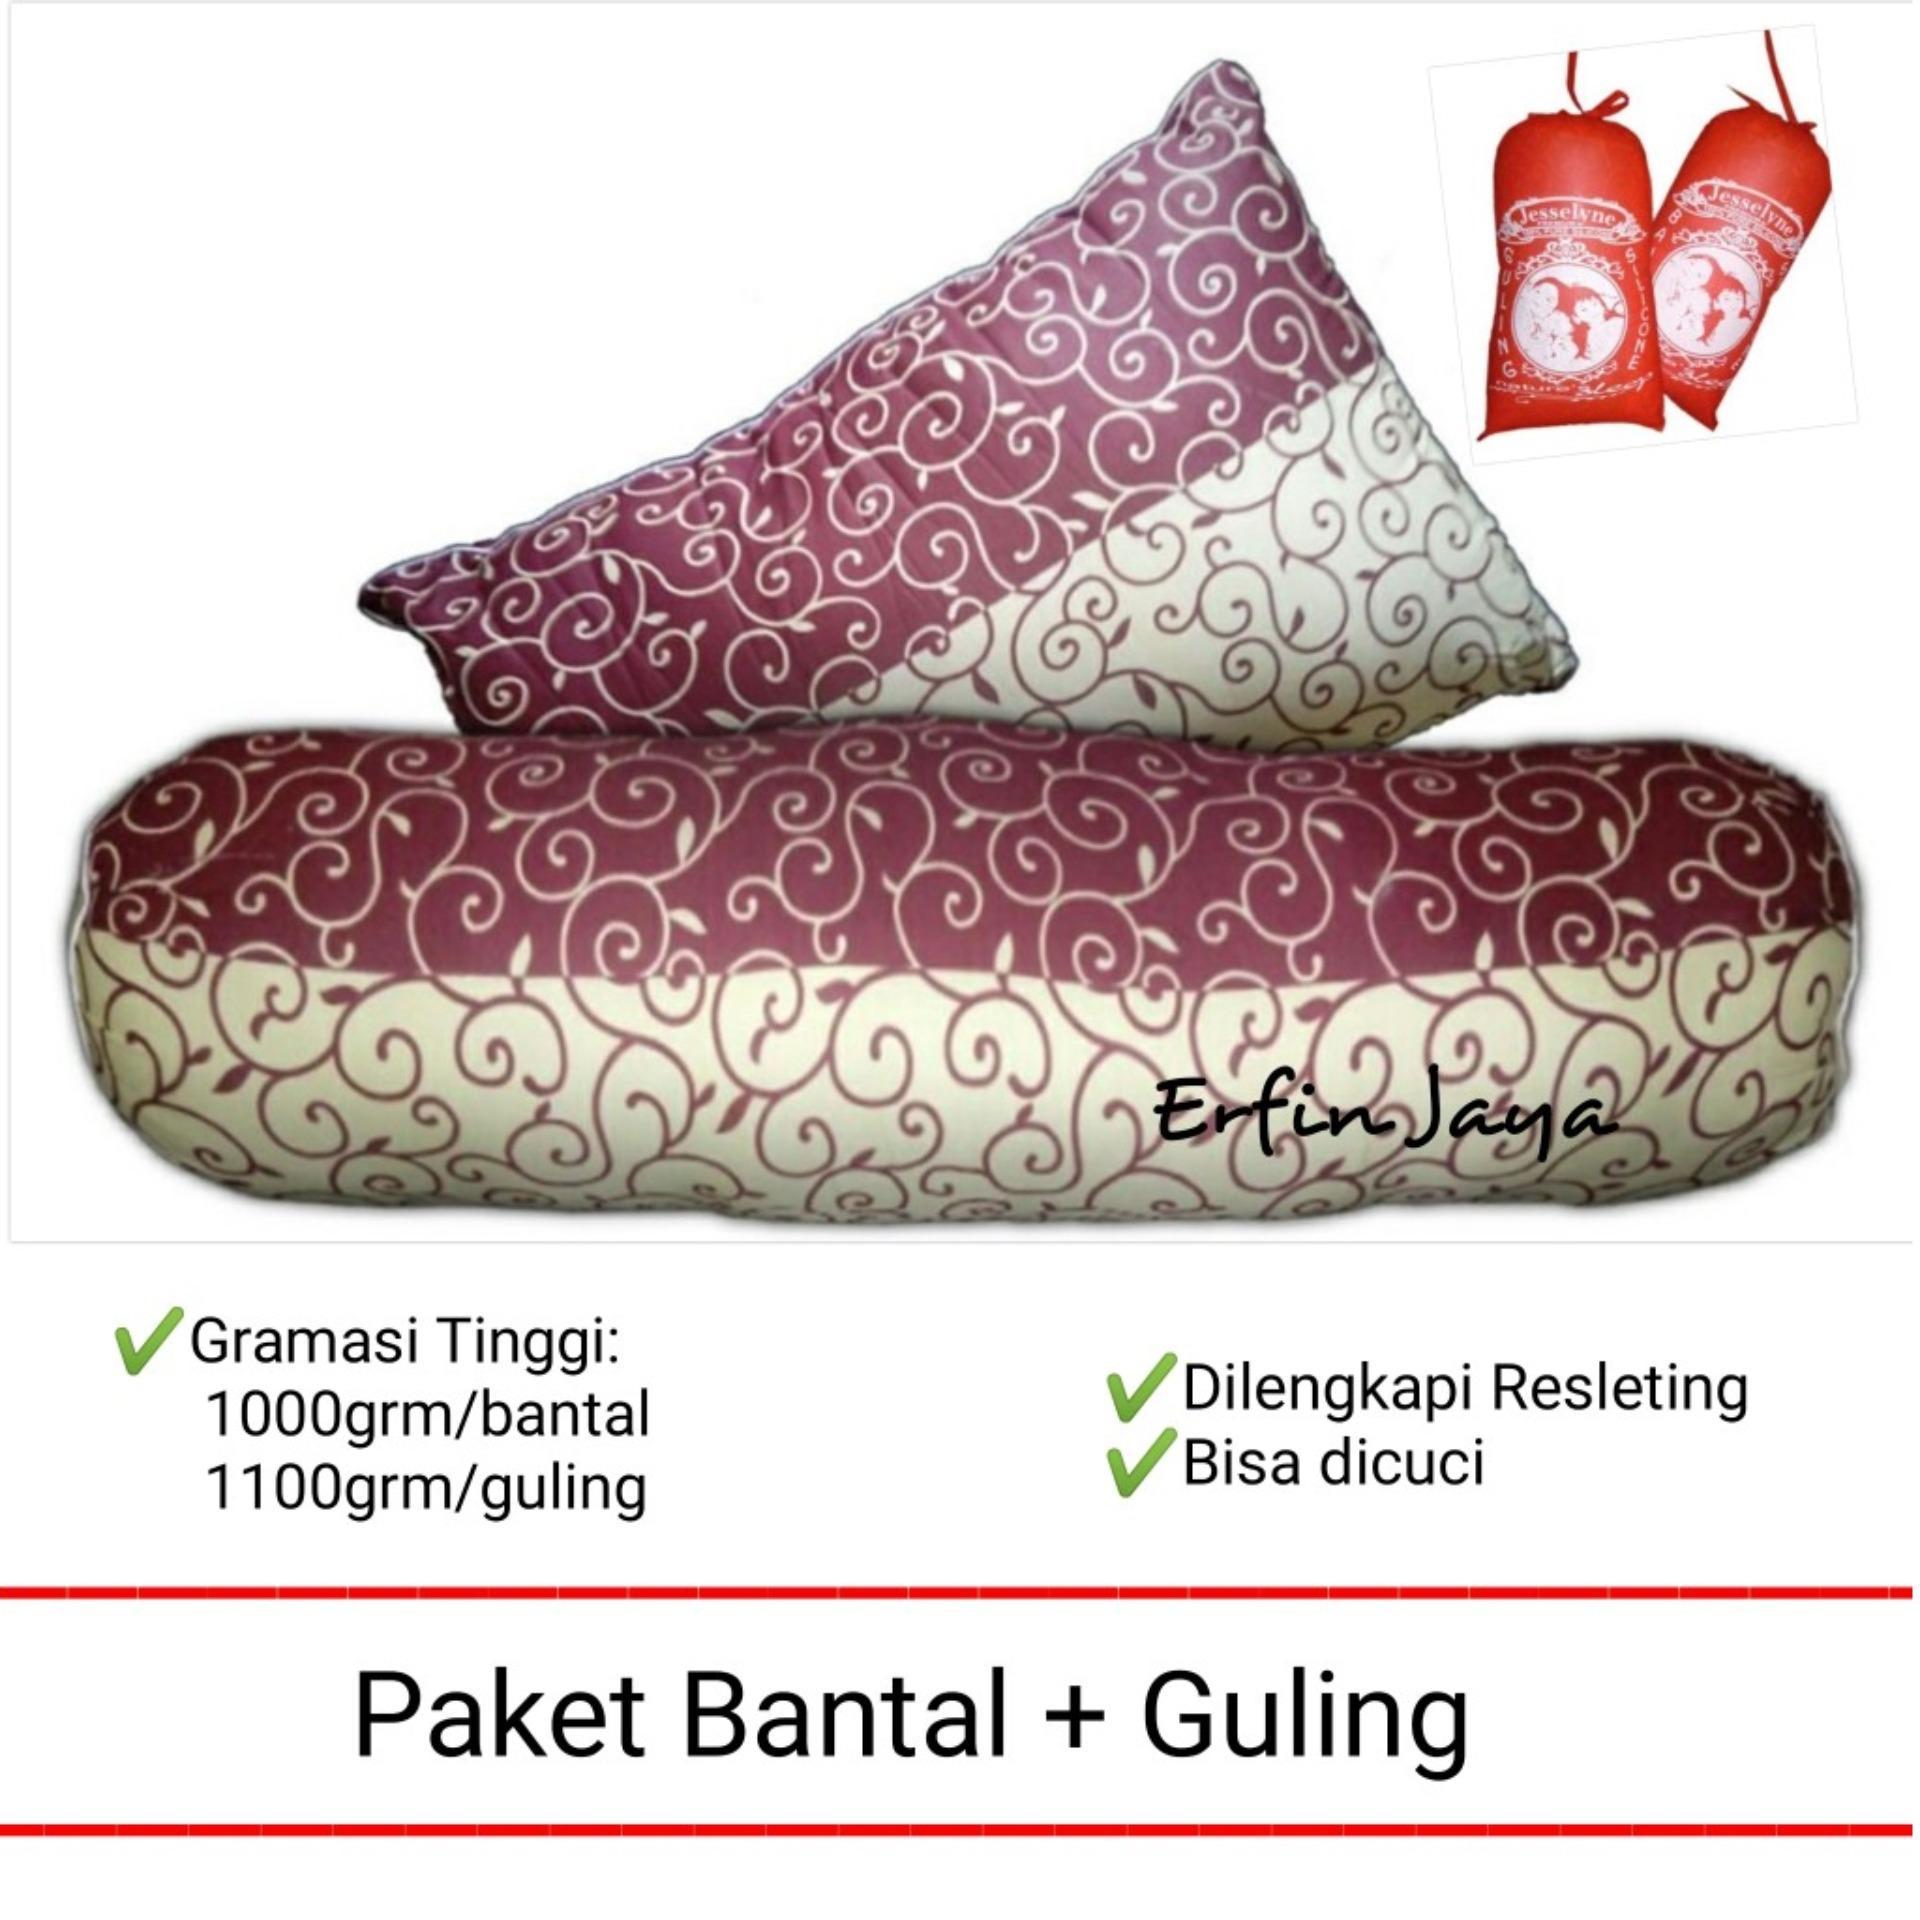 Buy Sell Cheapest Bantal Guling Hotel Best Quality Product Deals Dacron Ampamp Yuki Springbed Sepasang Tidur Jesselyn Premium Standart Original Multiwarna